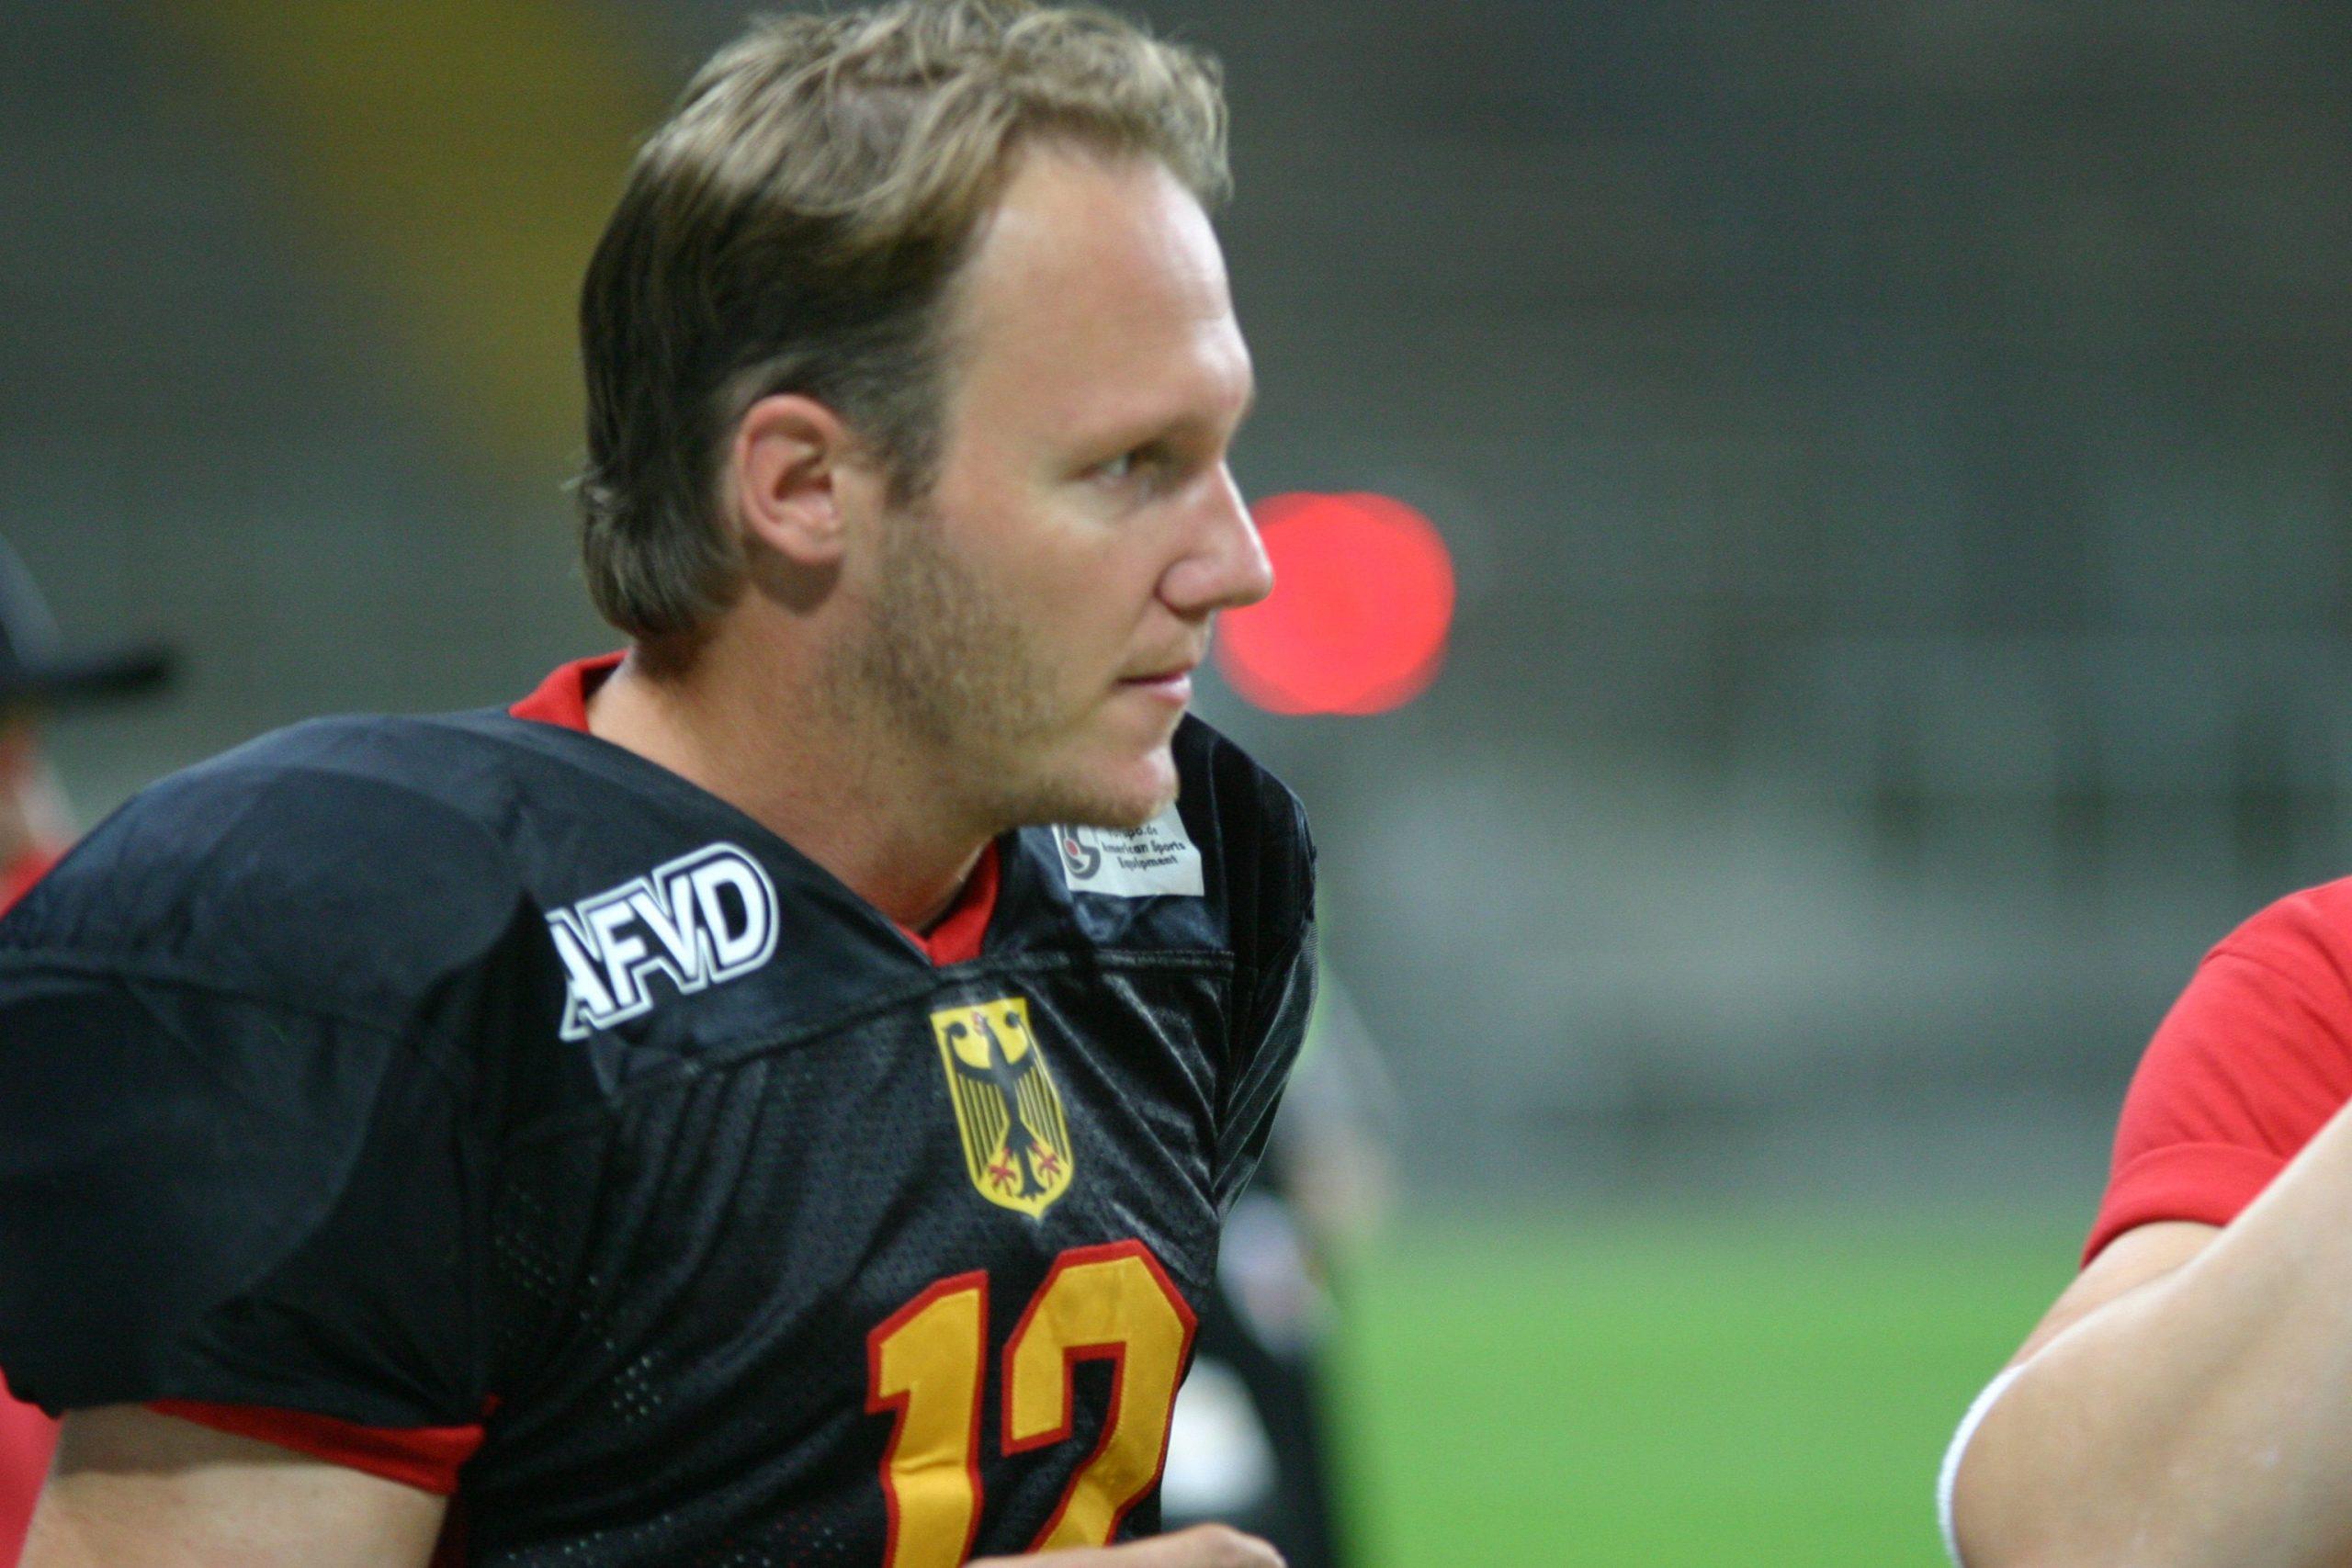 Jo Ullrich (Andreas Gebek)